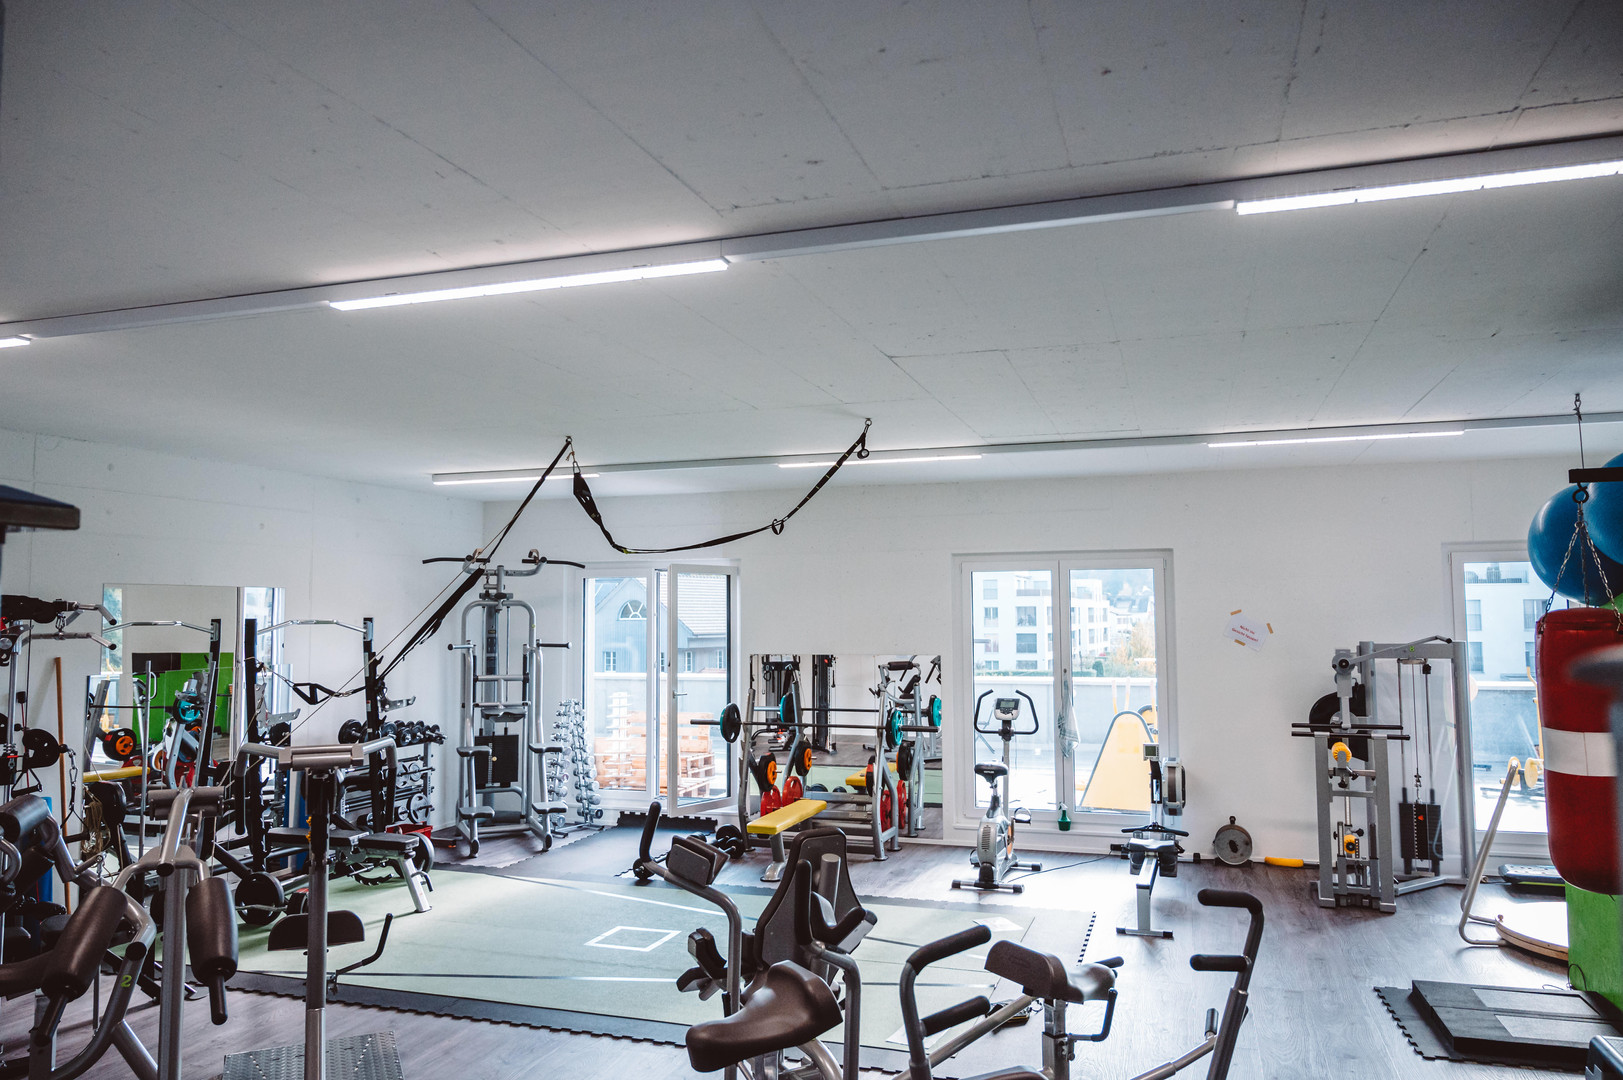 Fitness Studio Kollbrunn Gym Winterthur